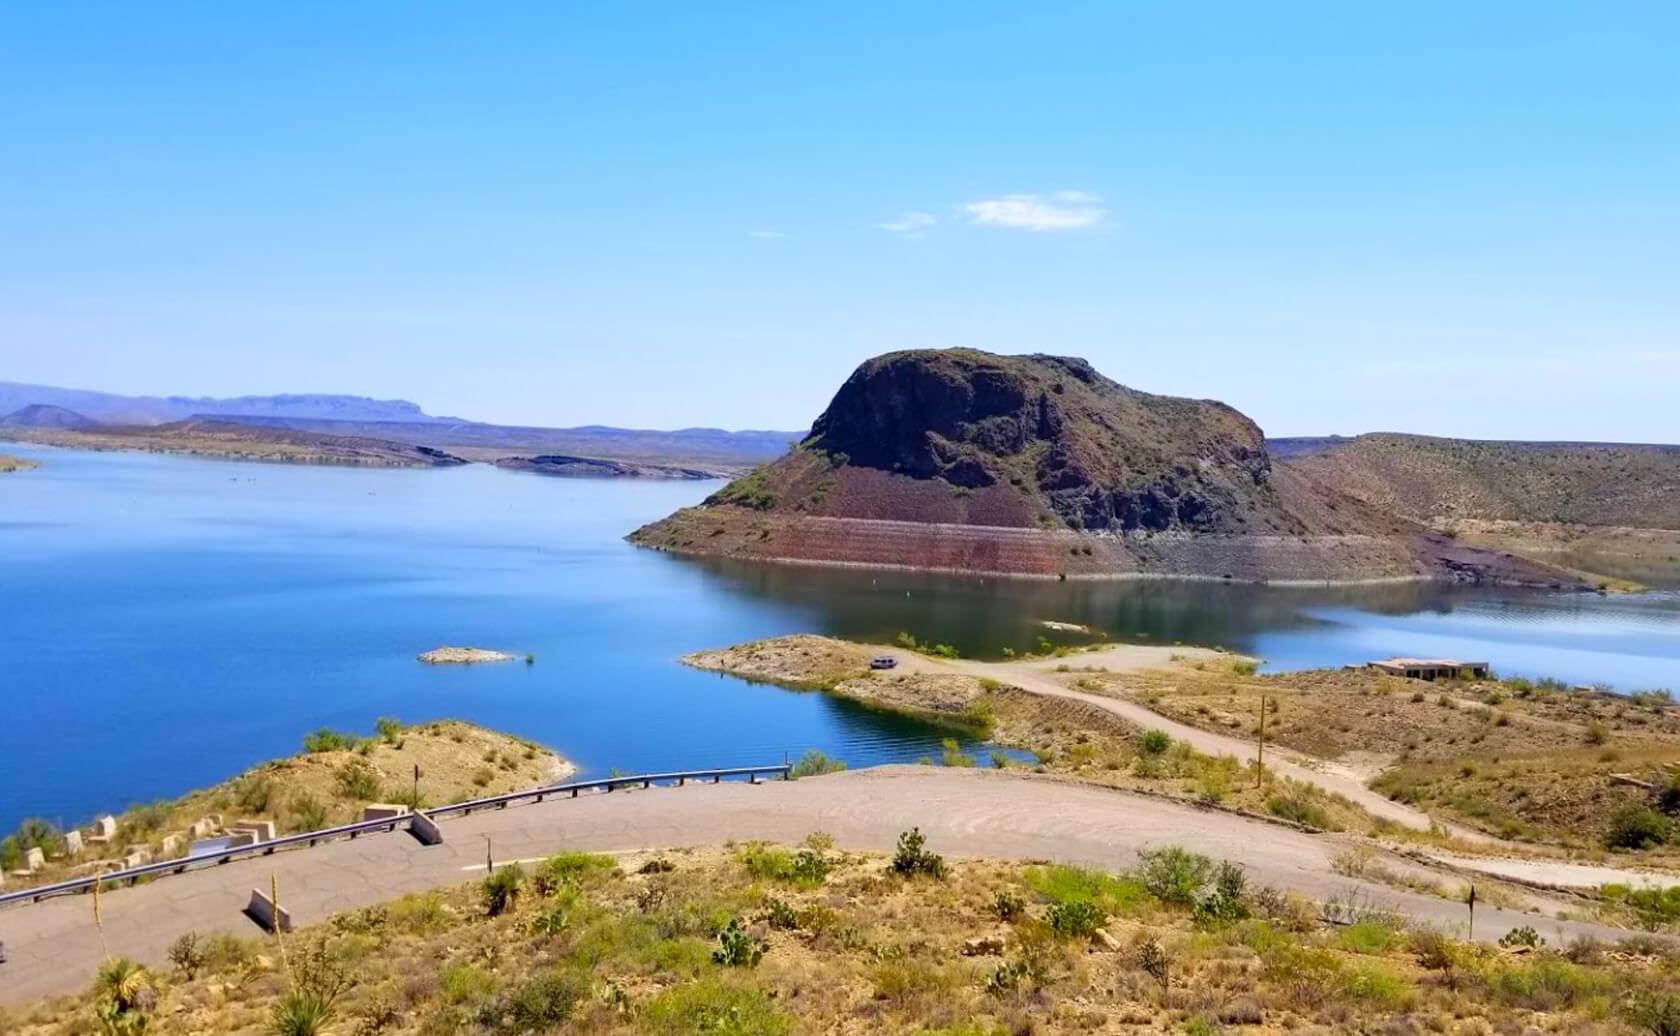 Elephant-Butte-Lake-Fishing-Guide-Report-Idaho-02